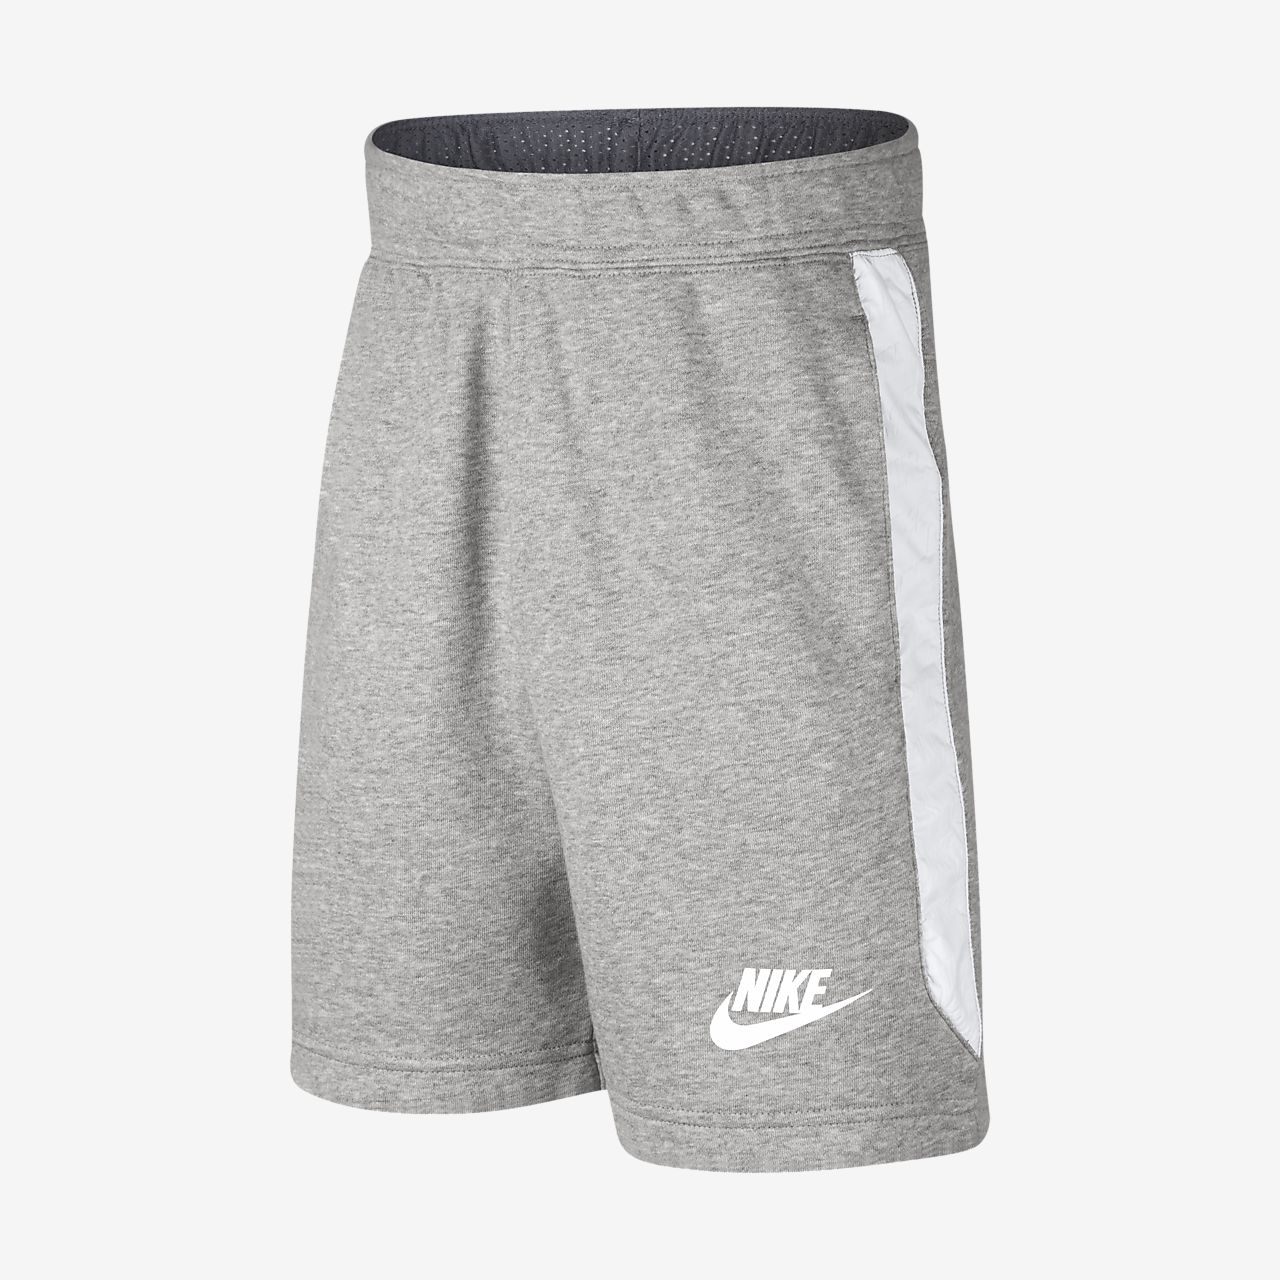 Für Kinderjungen Ältere Nike Sportswear Shorts c5RjLq4A3